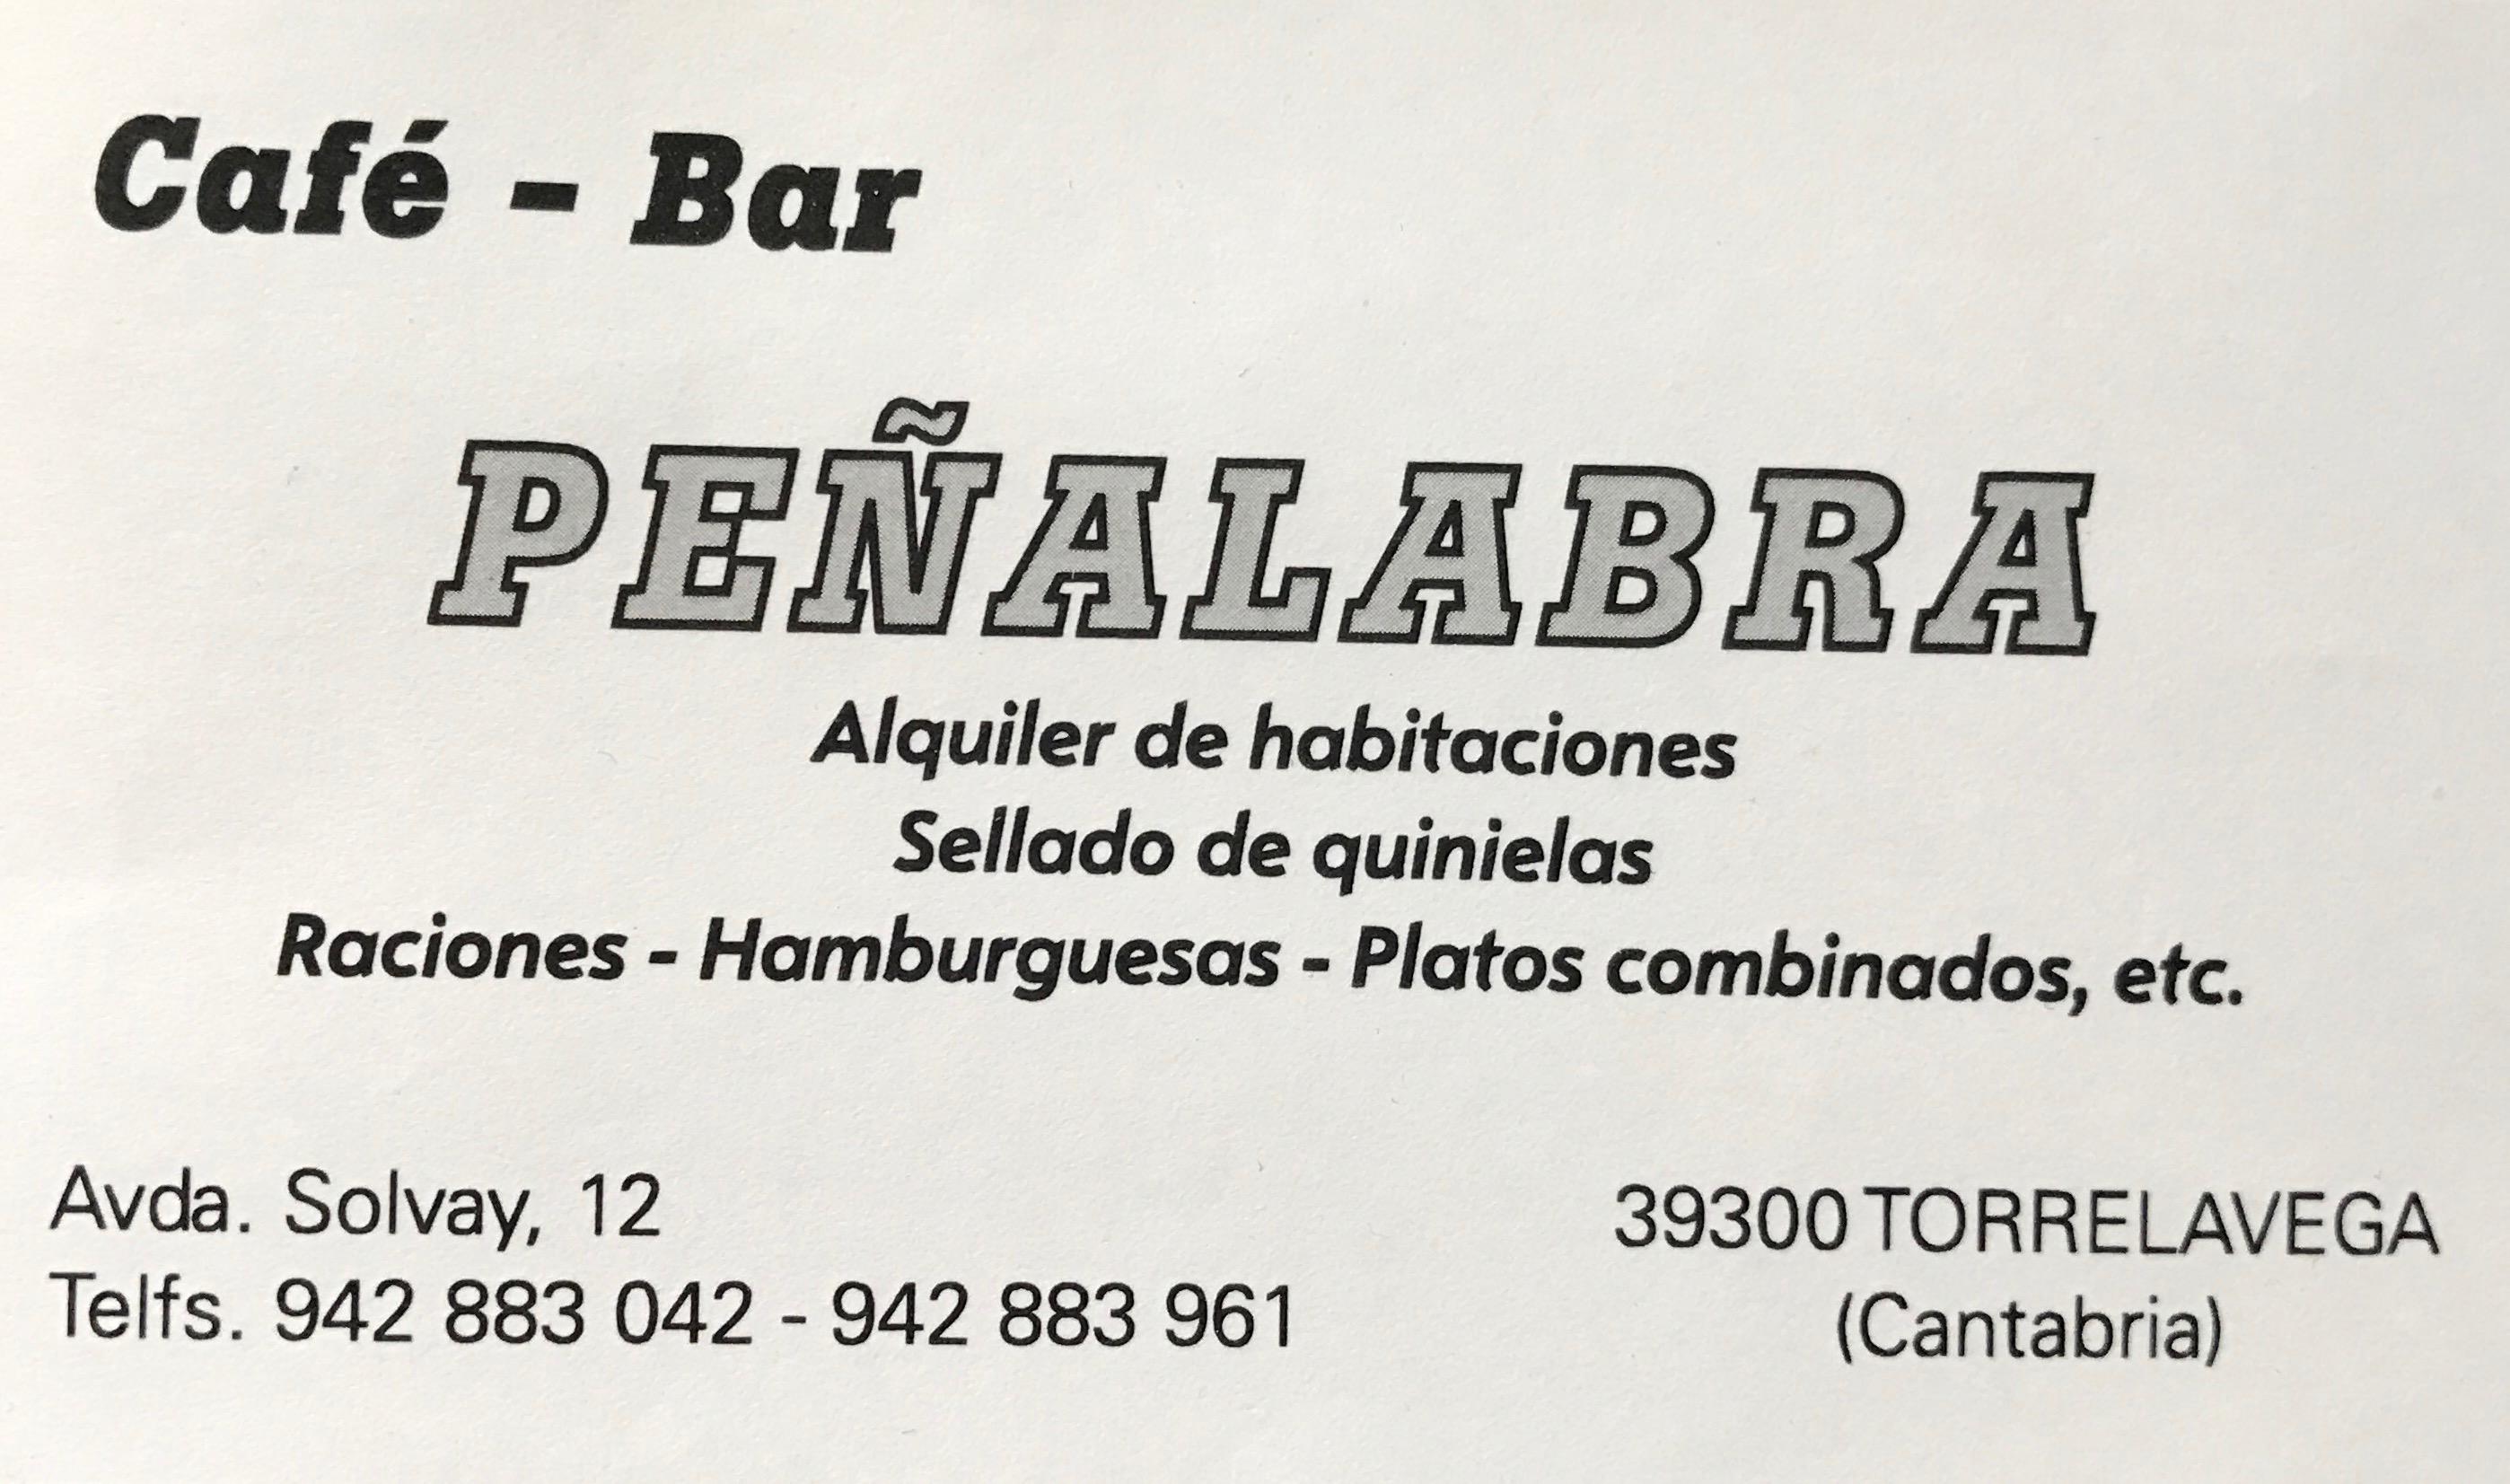 Café-Bar Peñalabra